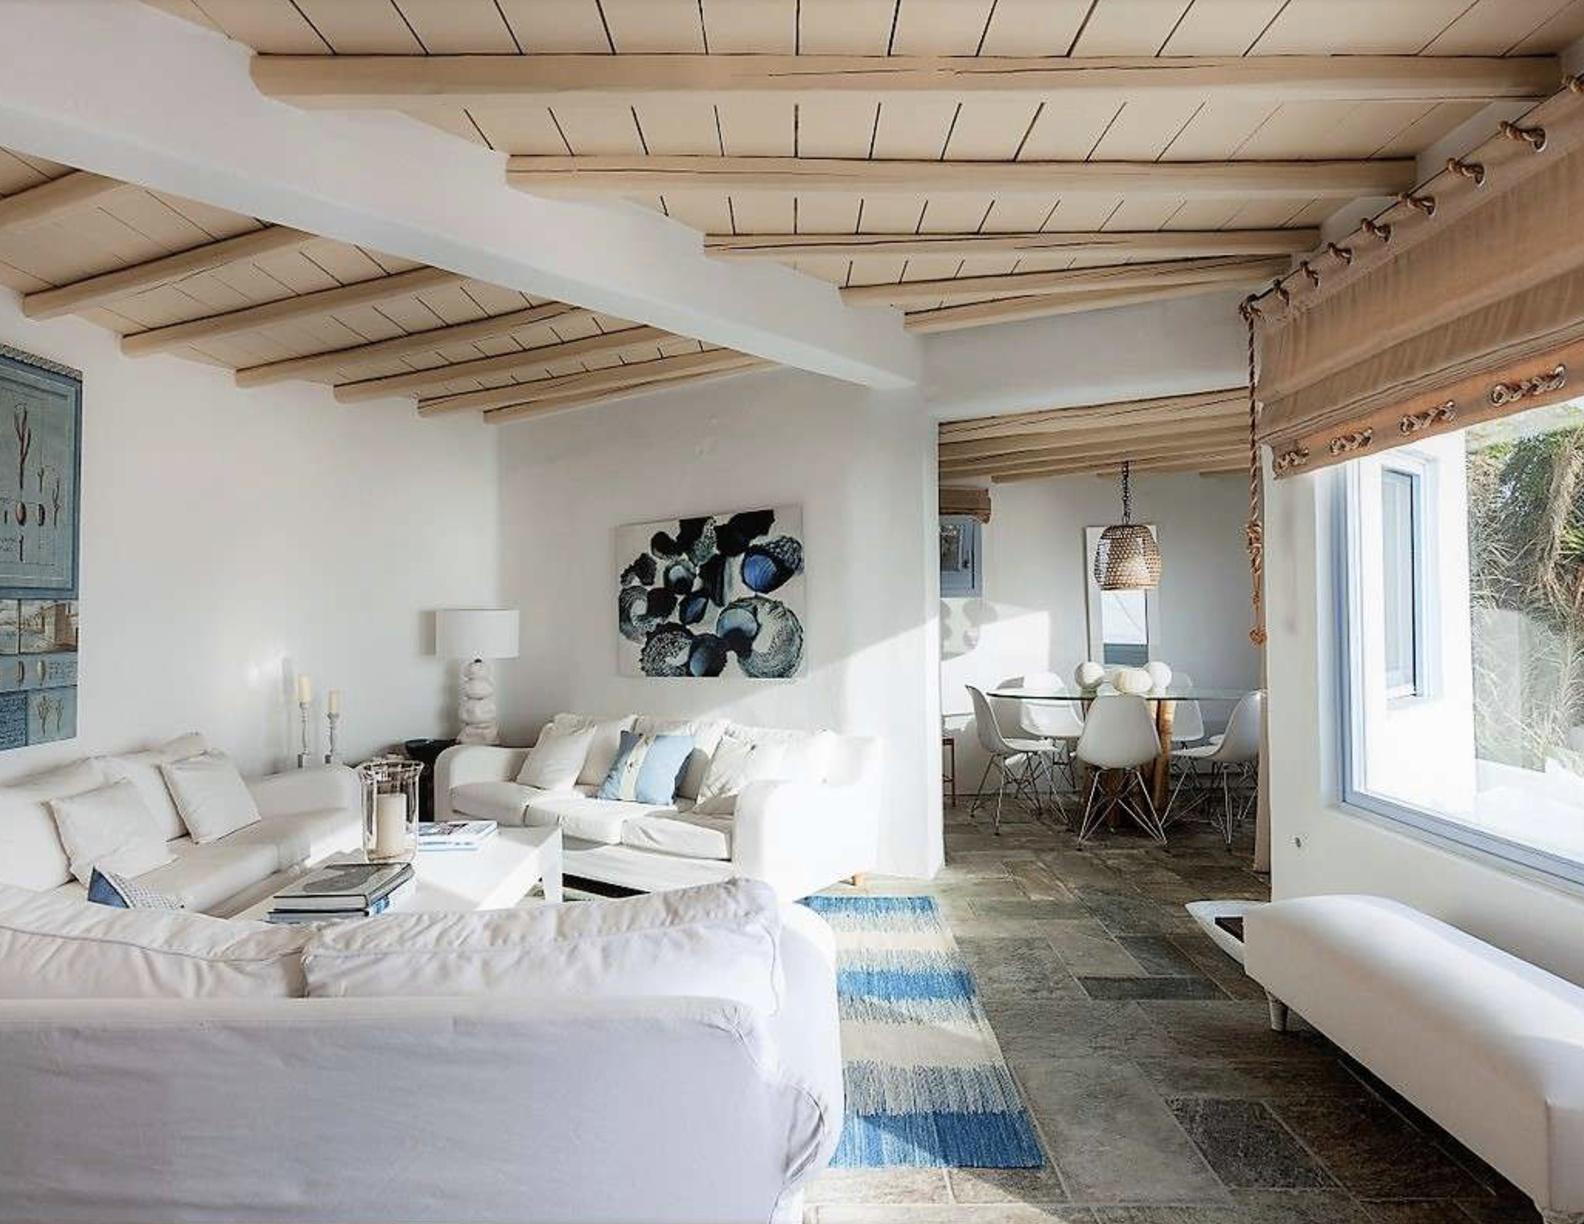 Villa-Abbi,-Mykonos-ilovepdf-compressed-011